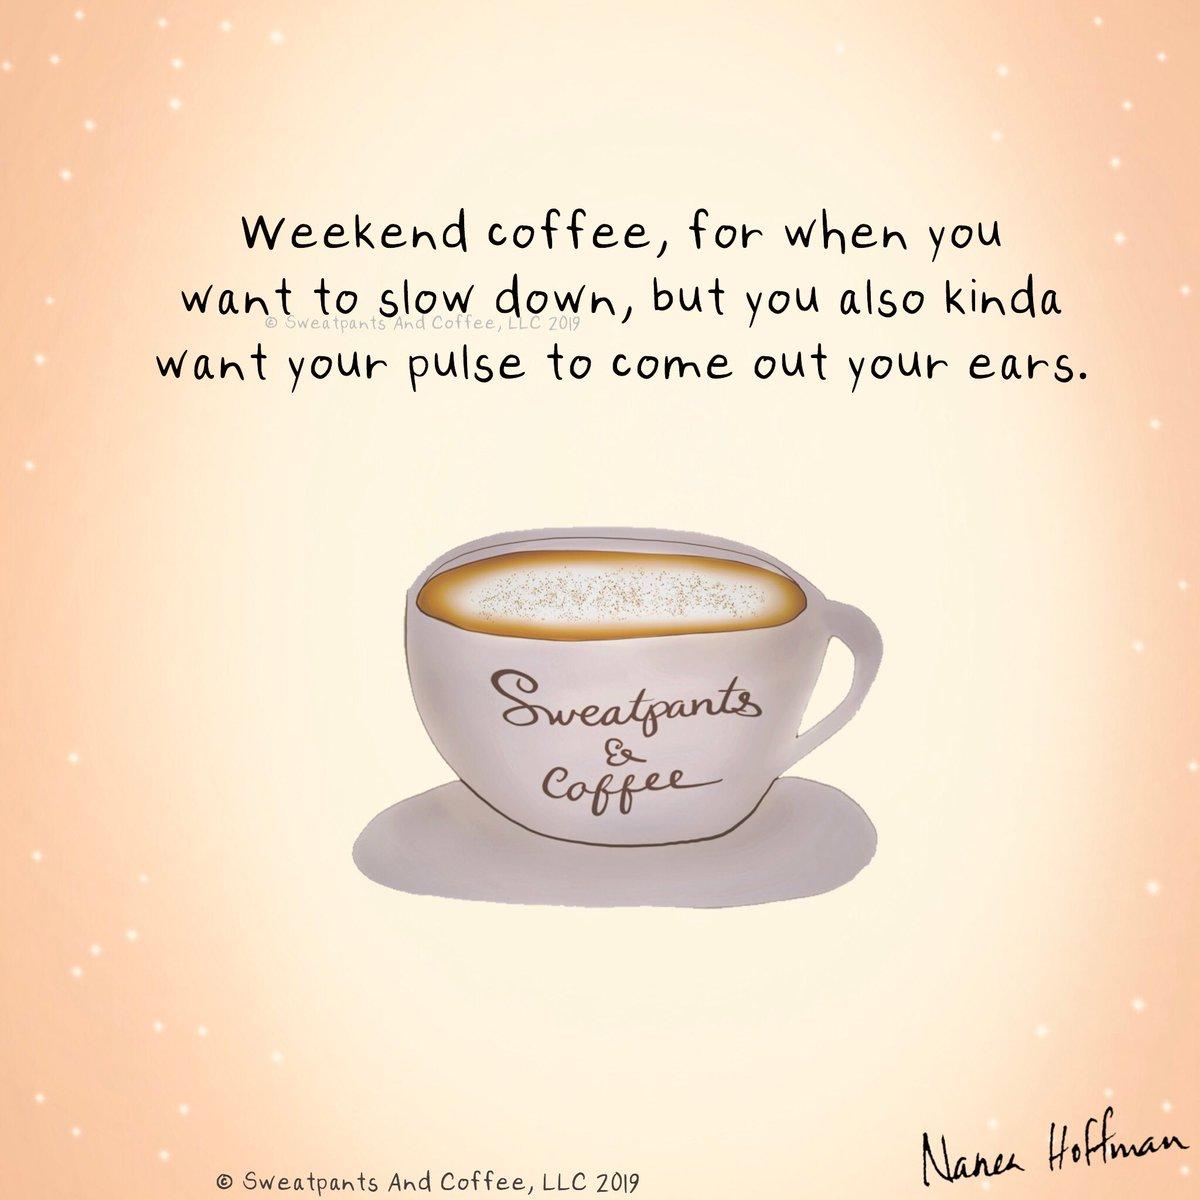 sweatpants coffee on happy saturday coffee